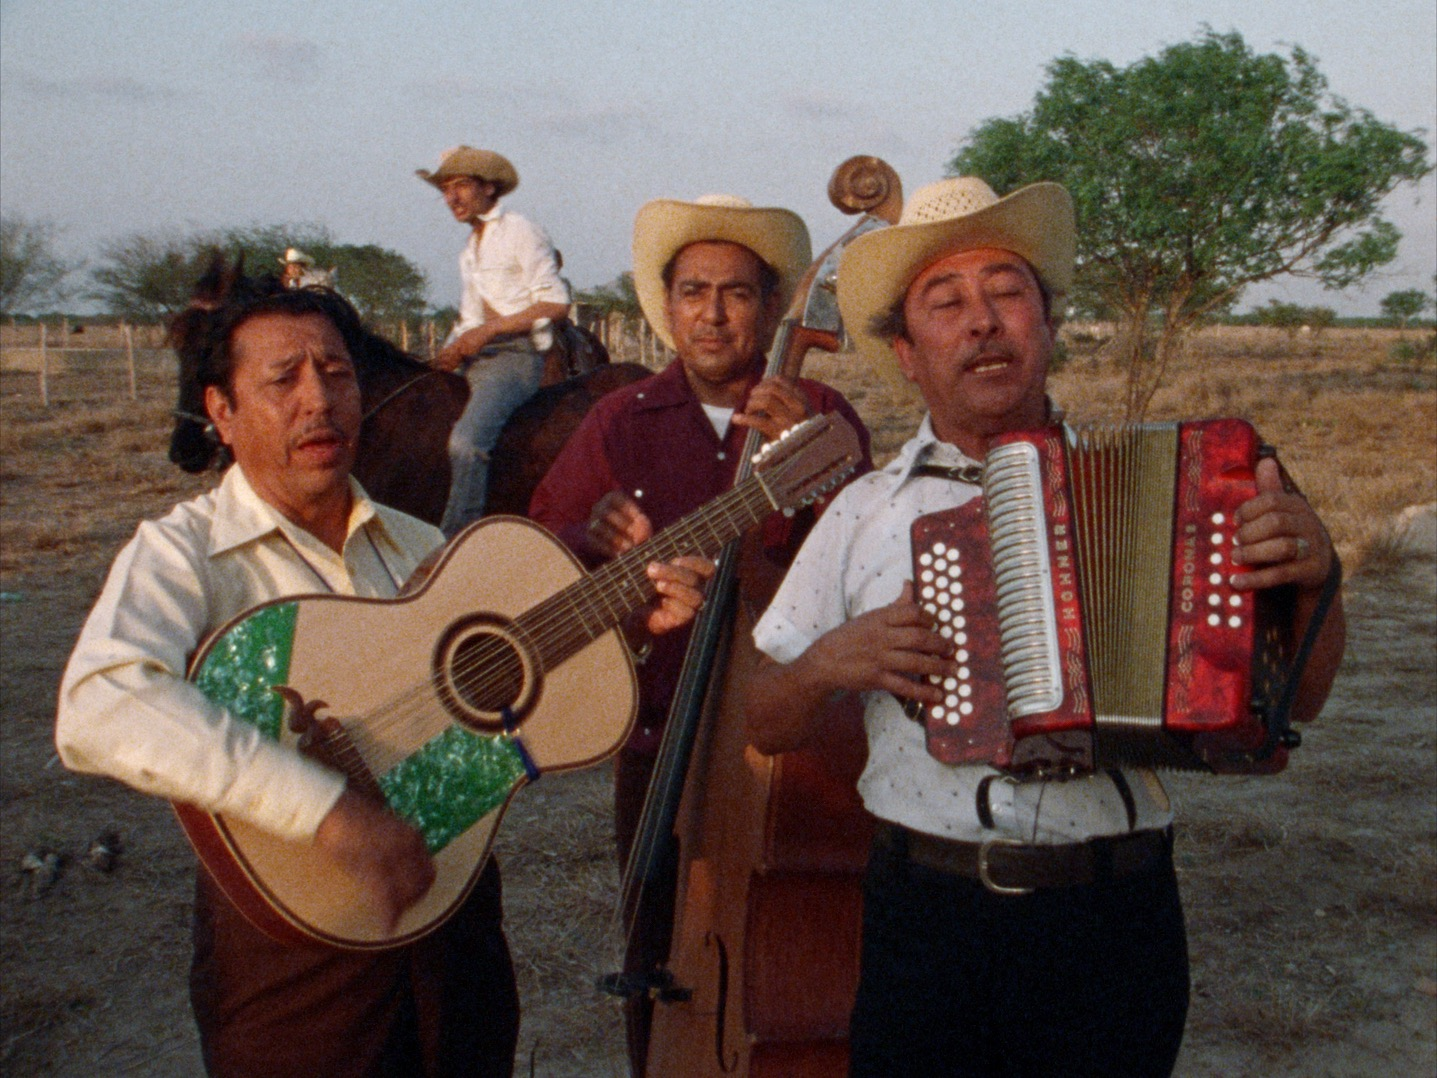 REVIEW: Rereleased 'Chulas Fronteras' Doc Celebrates the Norteño & Tejano Music of the Texas-Mexico Border